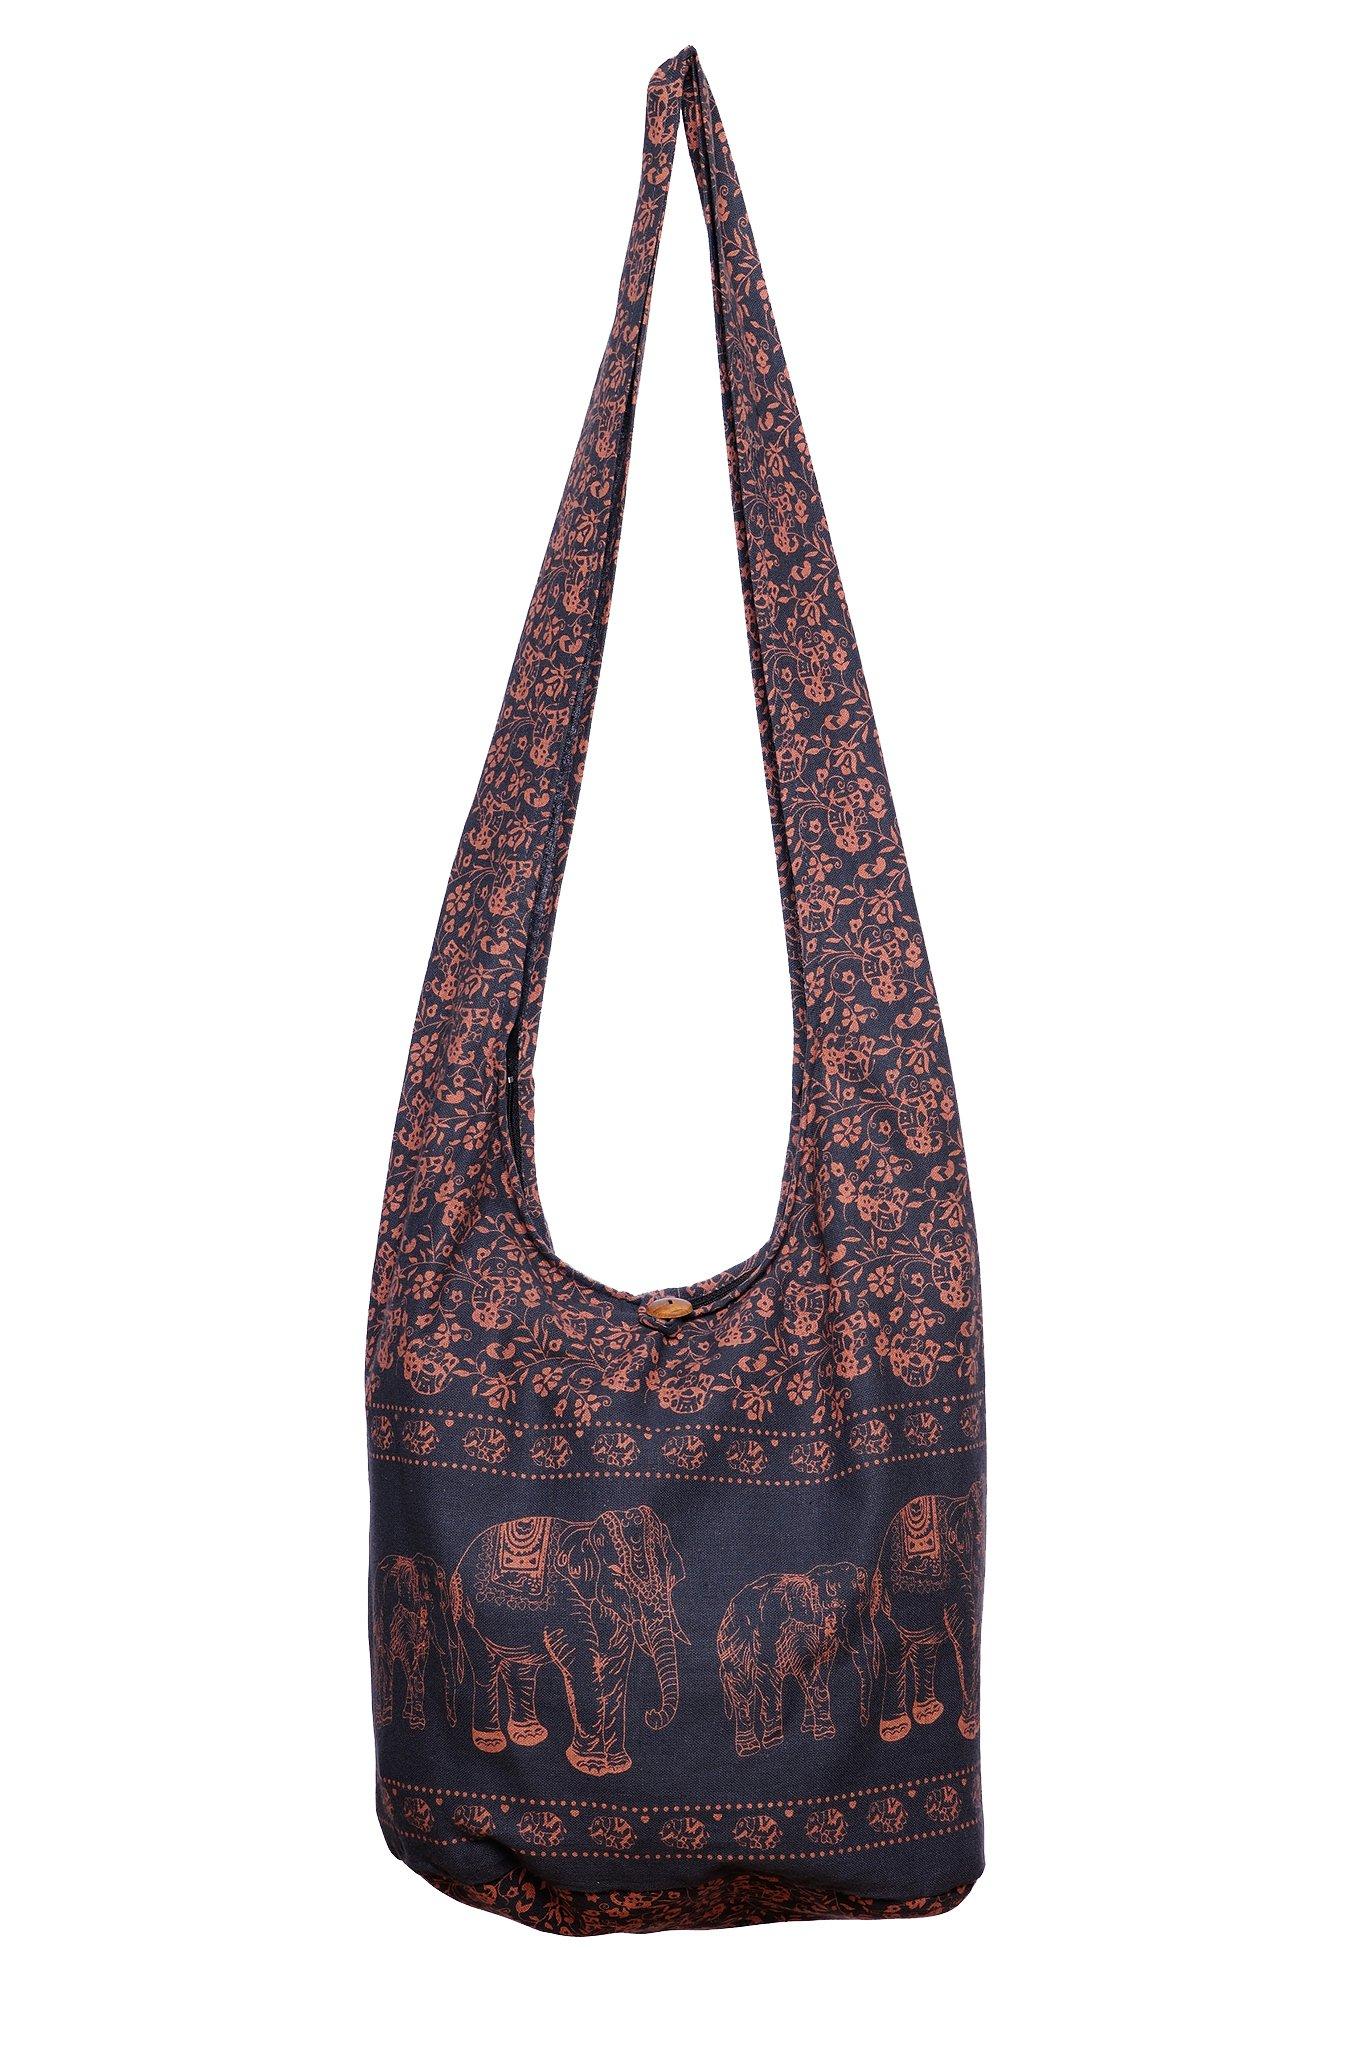 Avarada Thai Cotton Hippie Hobo Sling Crossbody Bag Messenger Purse Bohemian Print Elephant Large Deep Gray